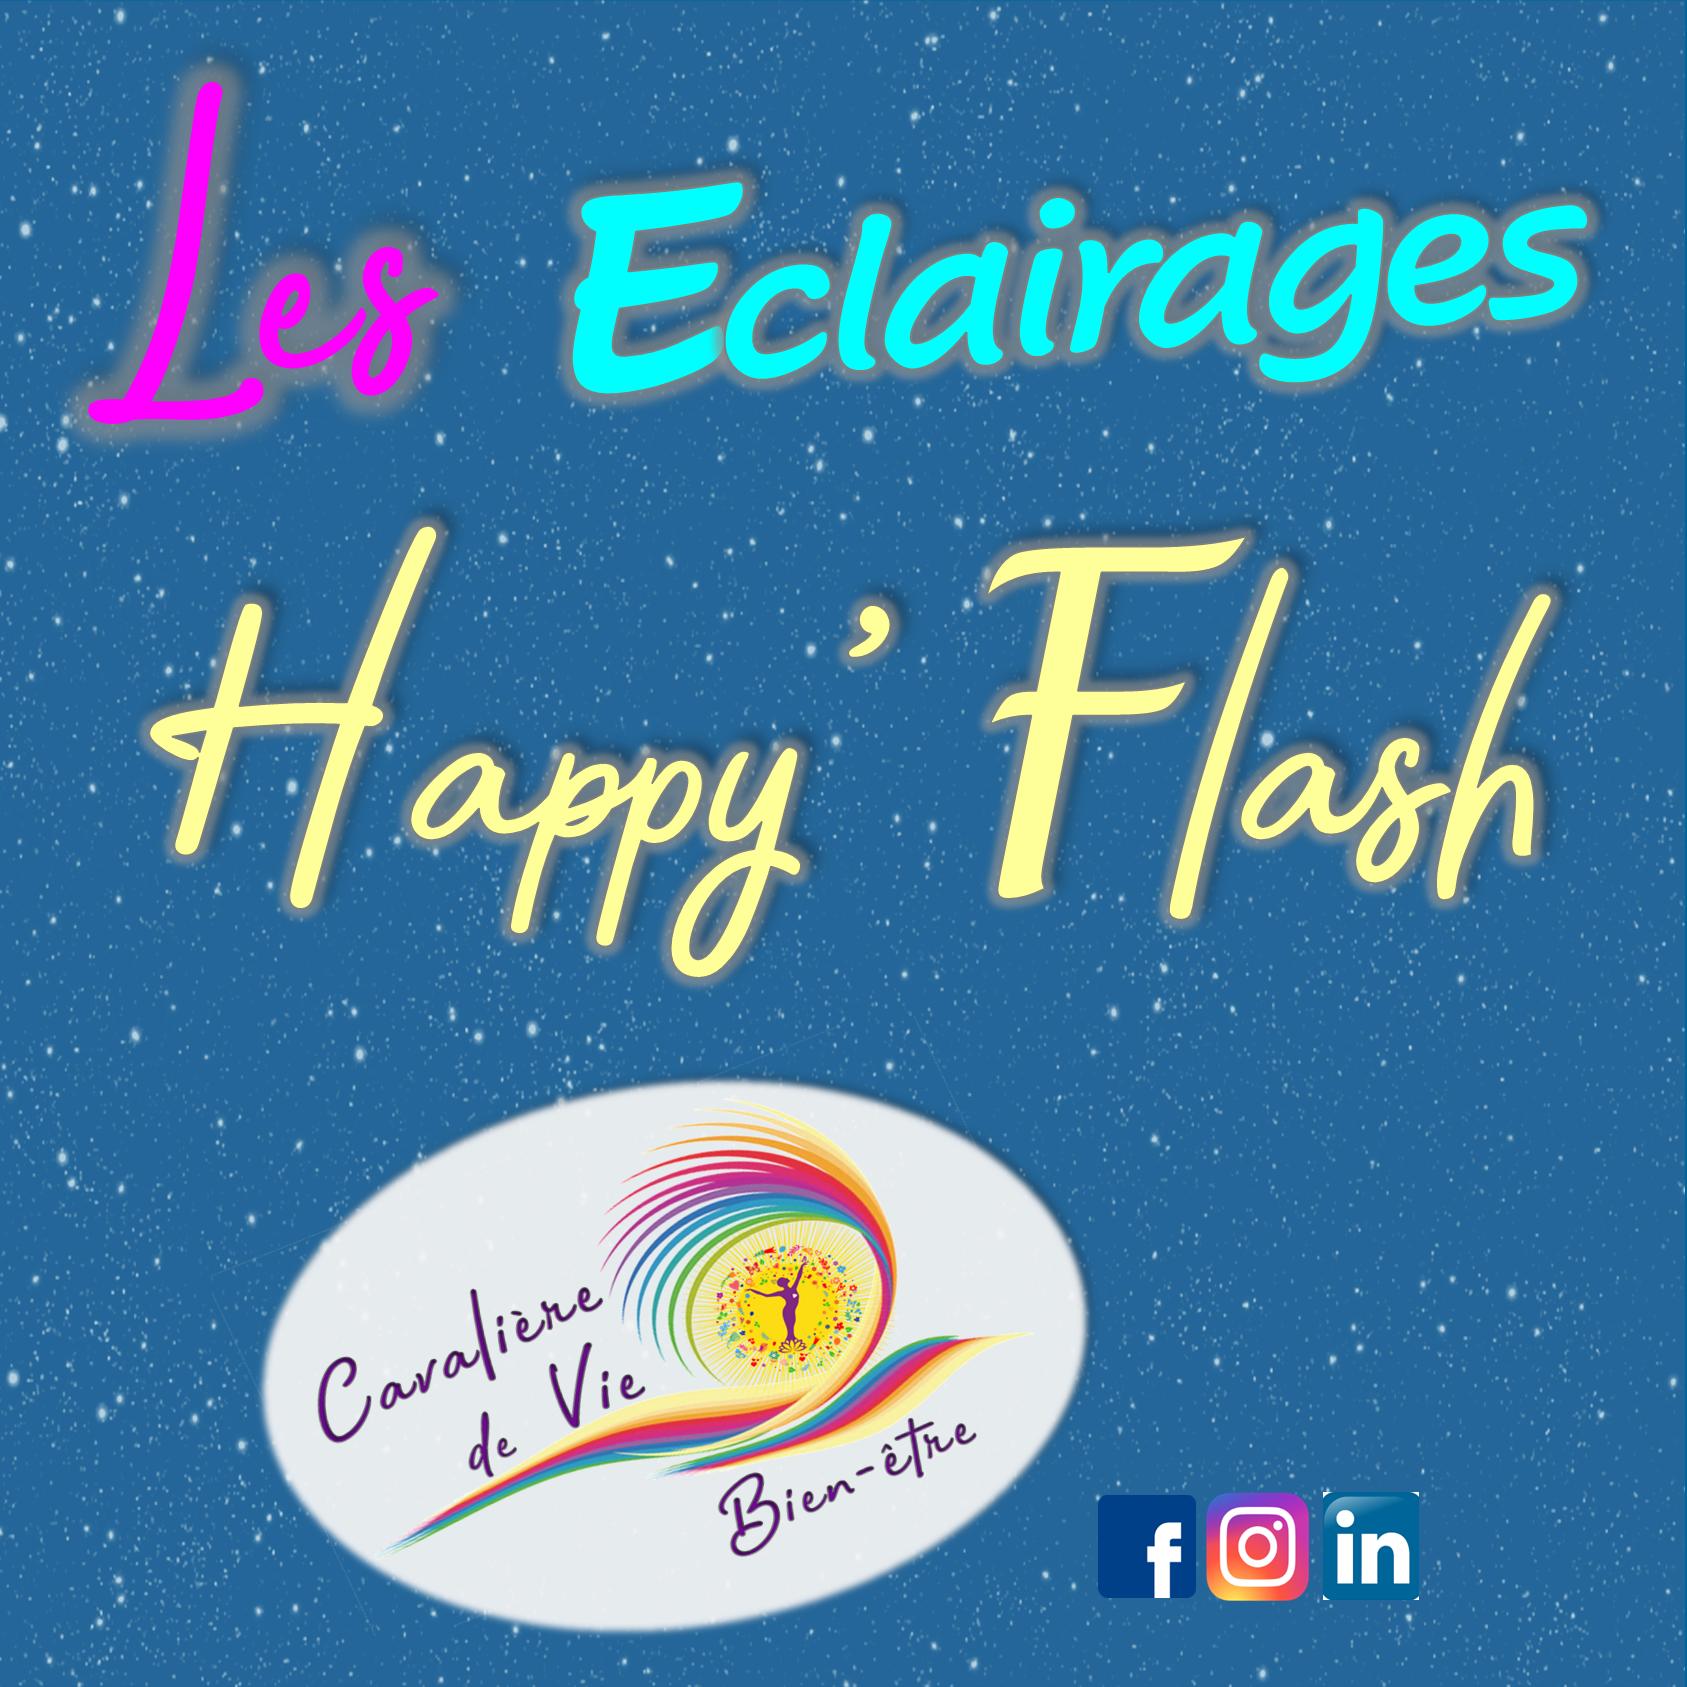 Eclairages Happy'Flash